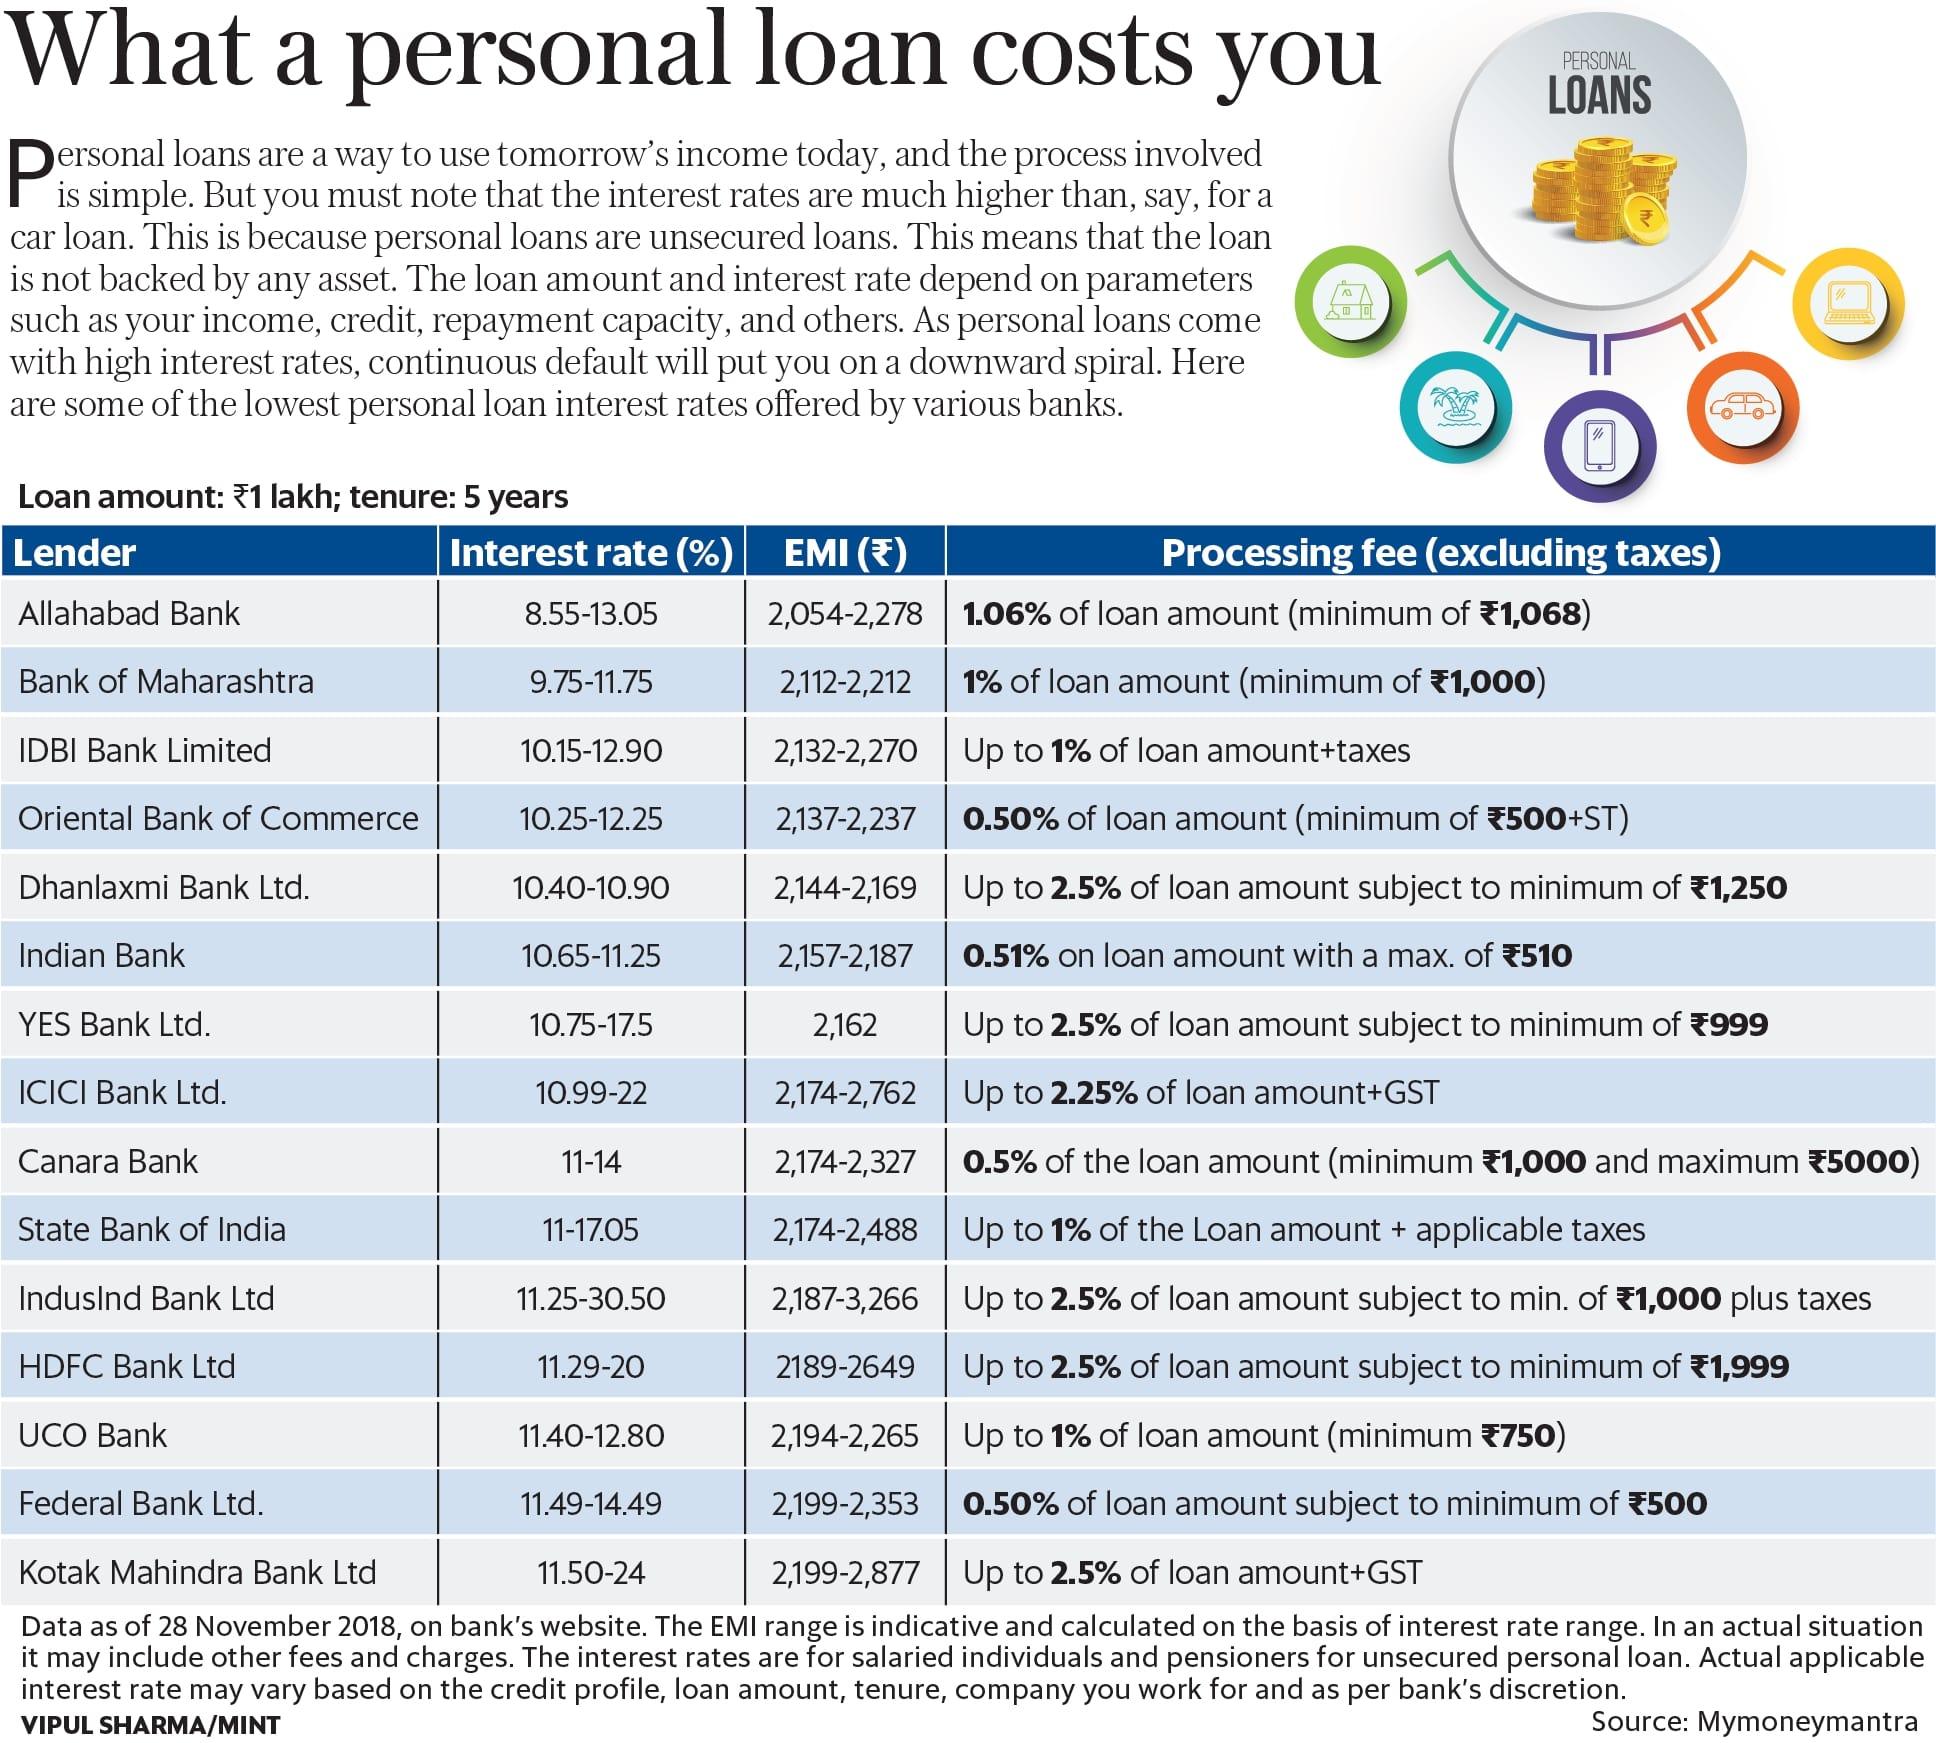 Personal loan interest rates: SBI vs ICICI Bank vs HDFC Bank - Livemint